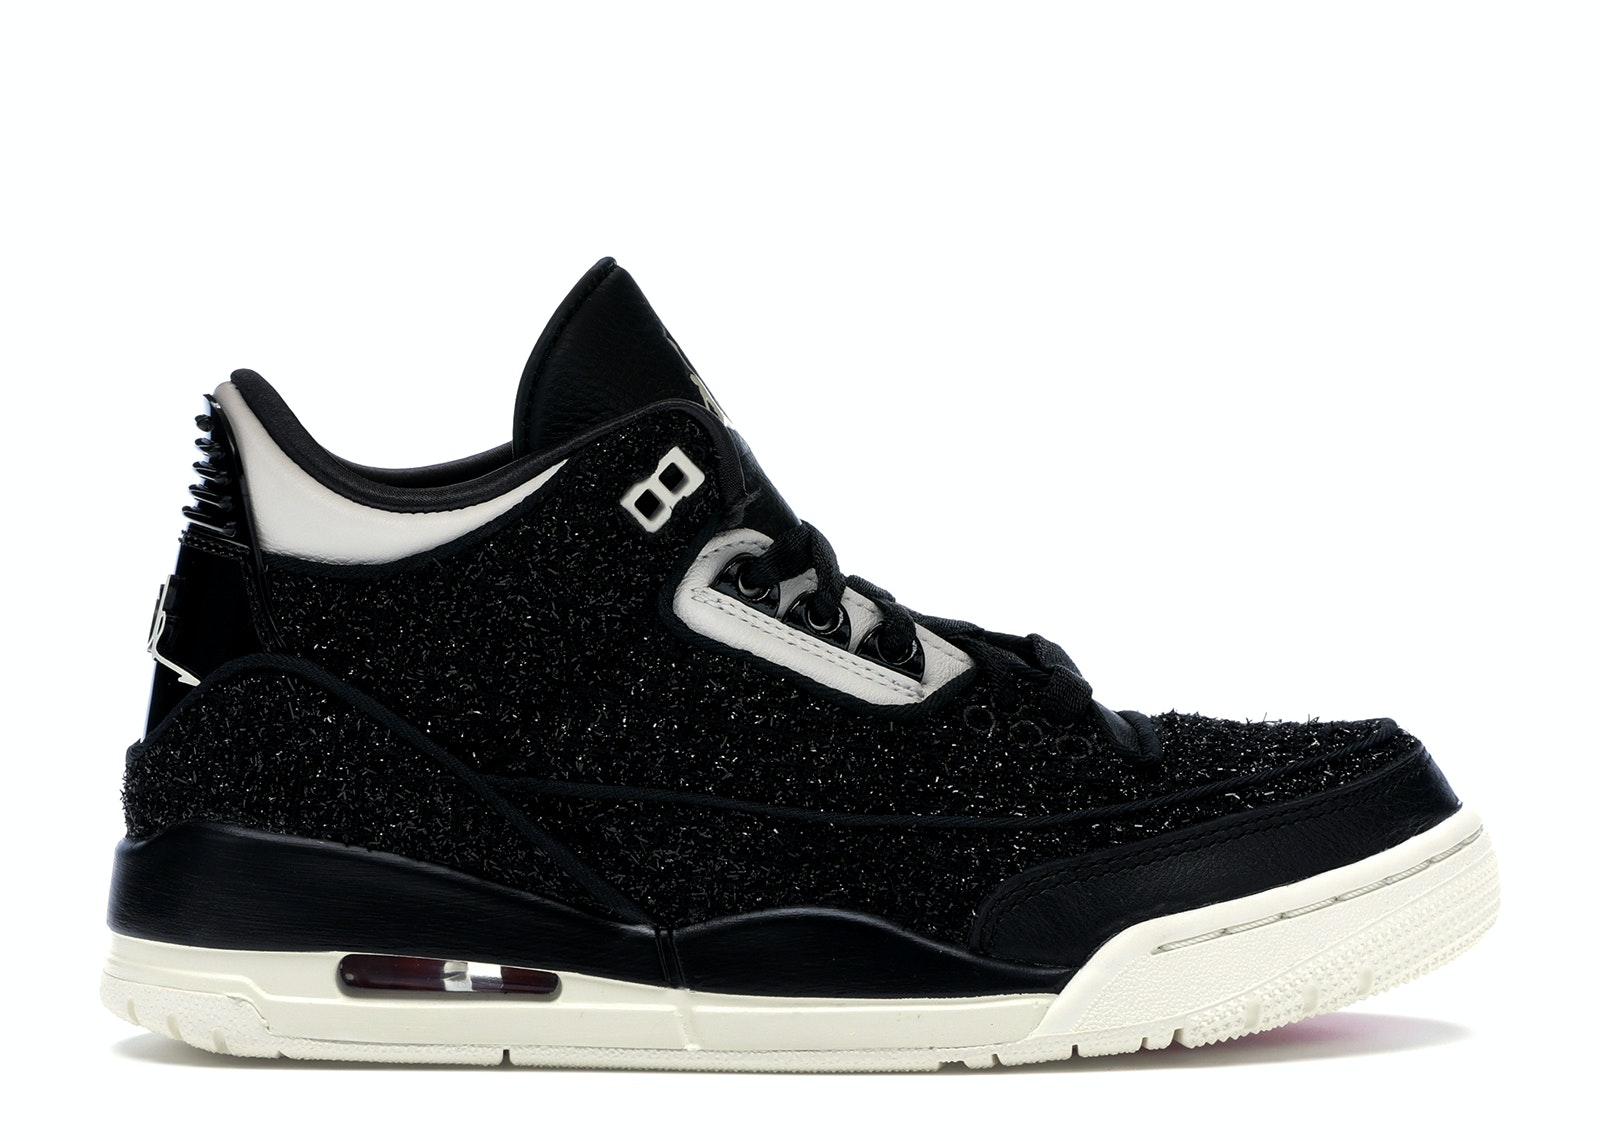 Jordan 3 Retro AWOK Vogue Black (W)